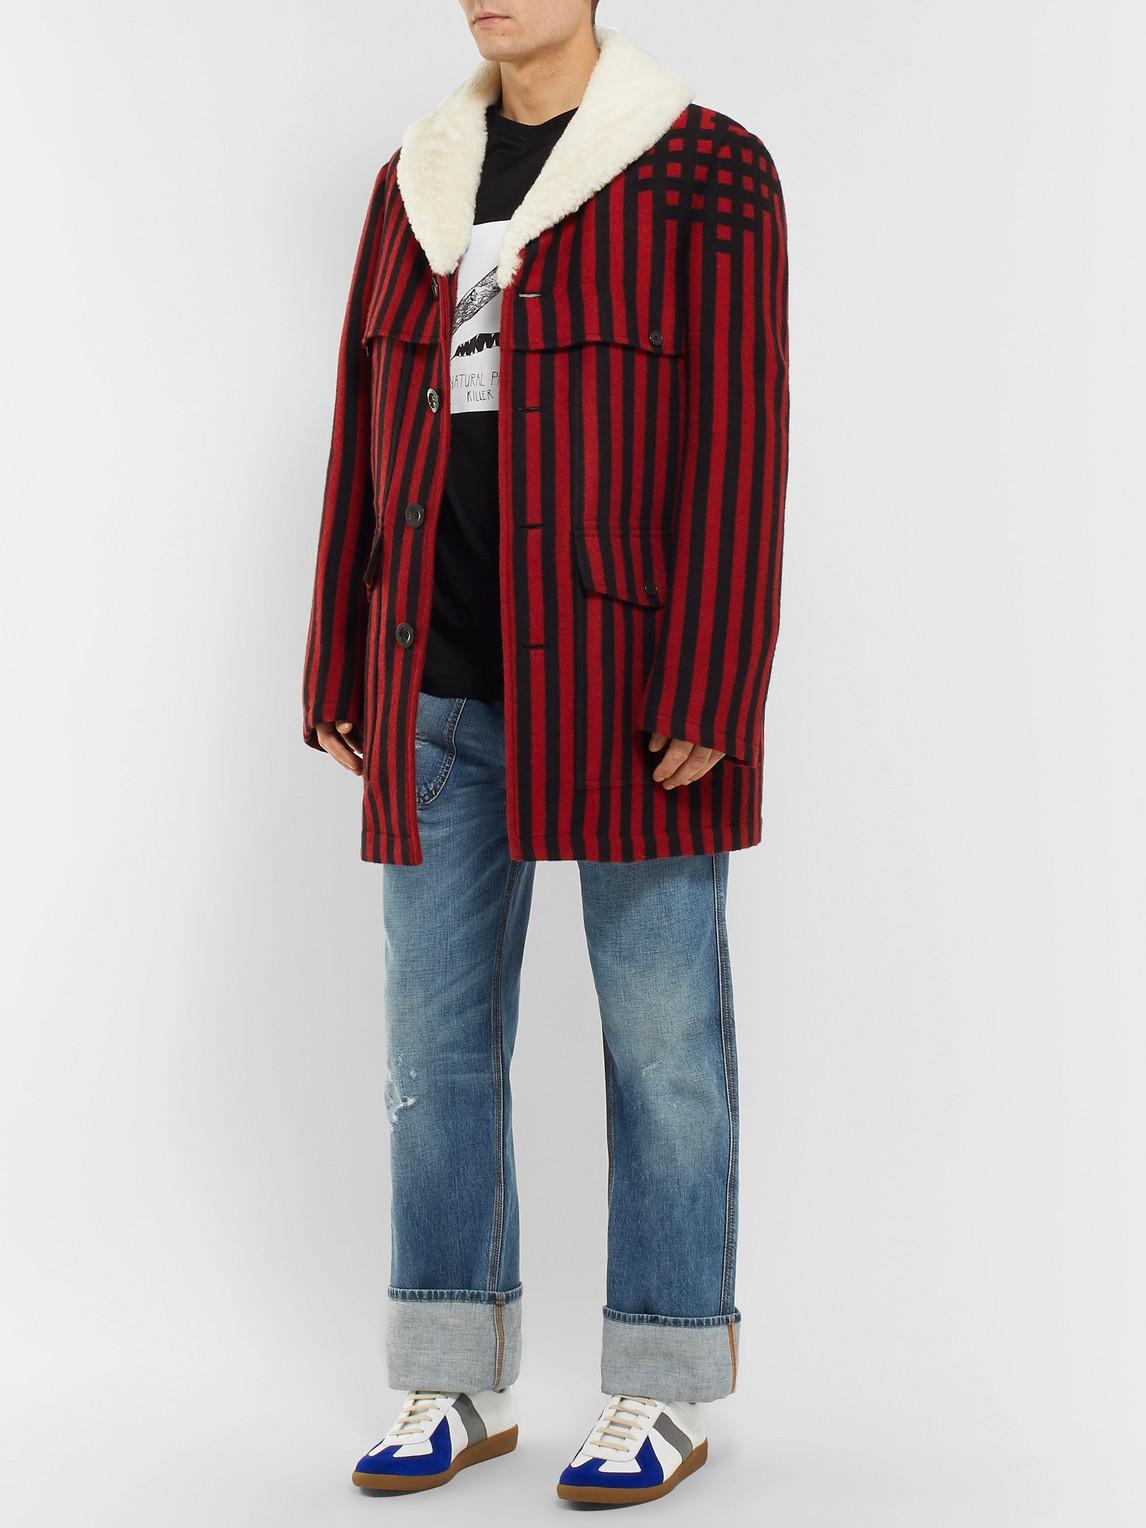 Loewe Coats SHEARLING-LINED STRIPED WOOL AND SILK-BLEND JACQUARD COAT